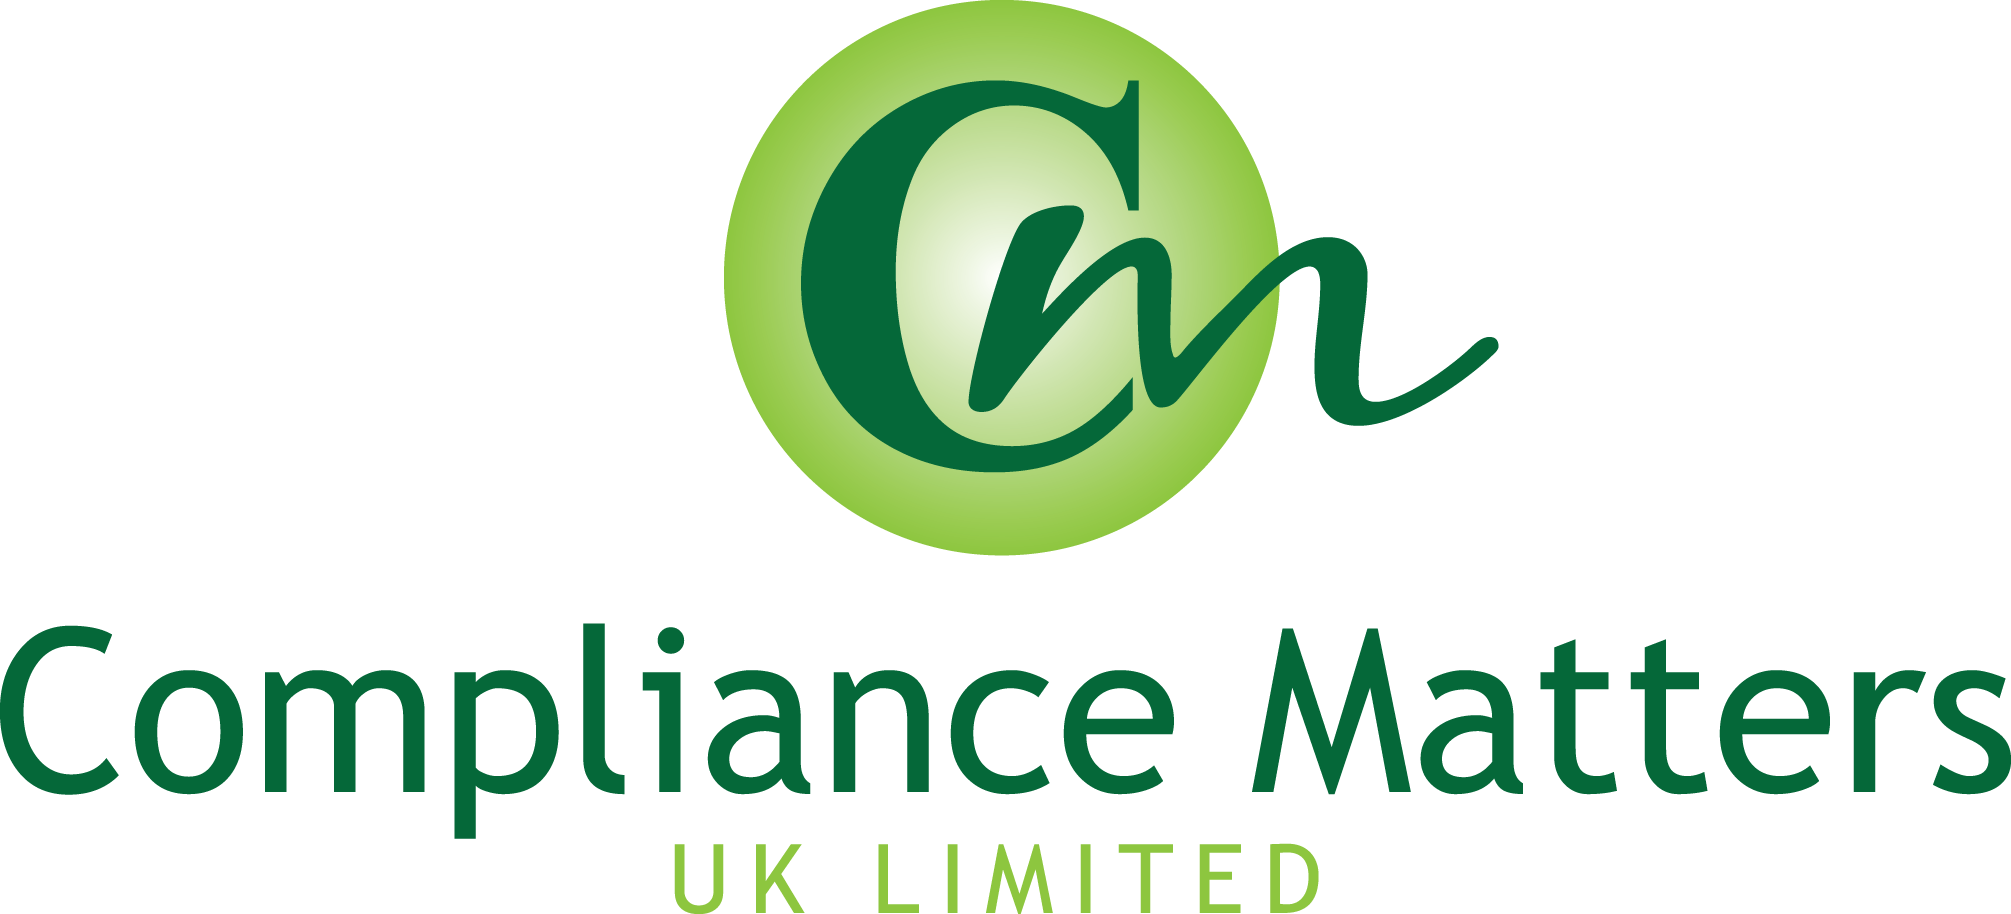 Compliance Matters UK Limited